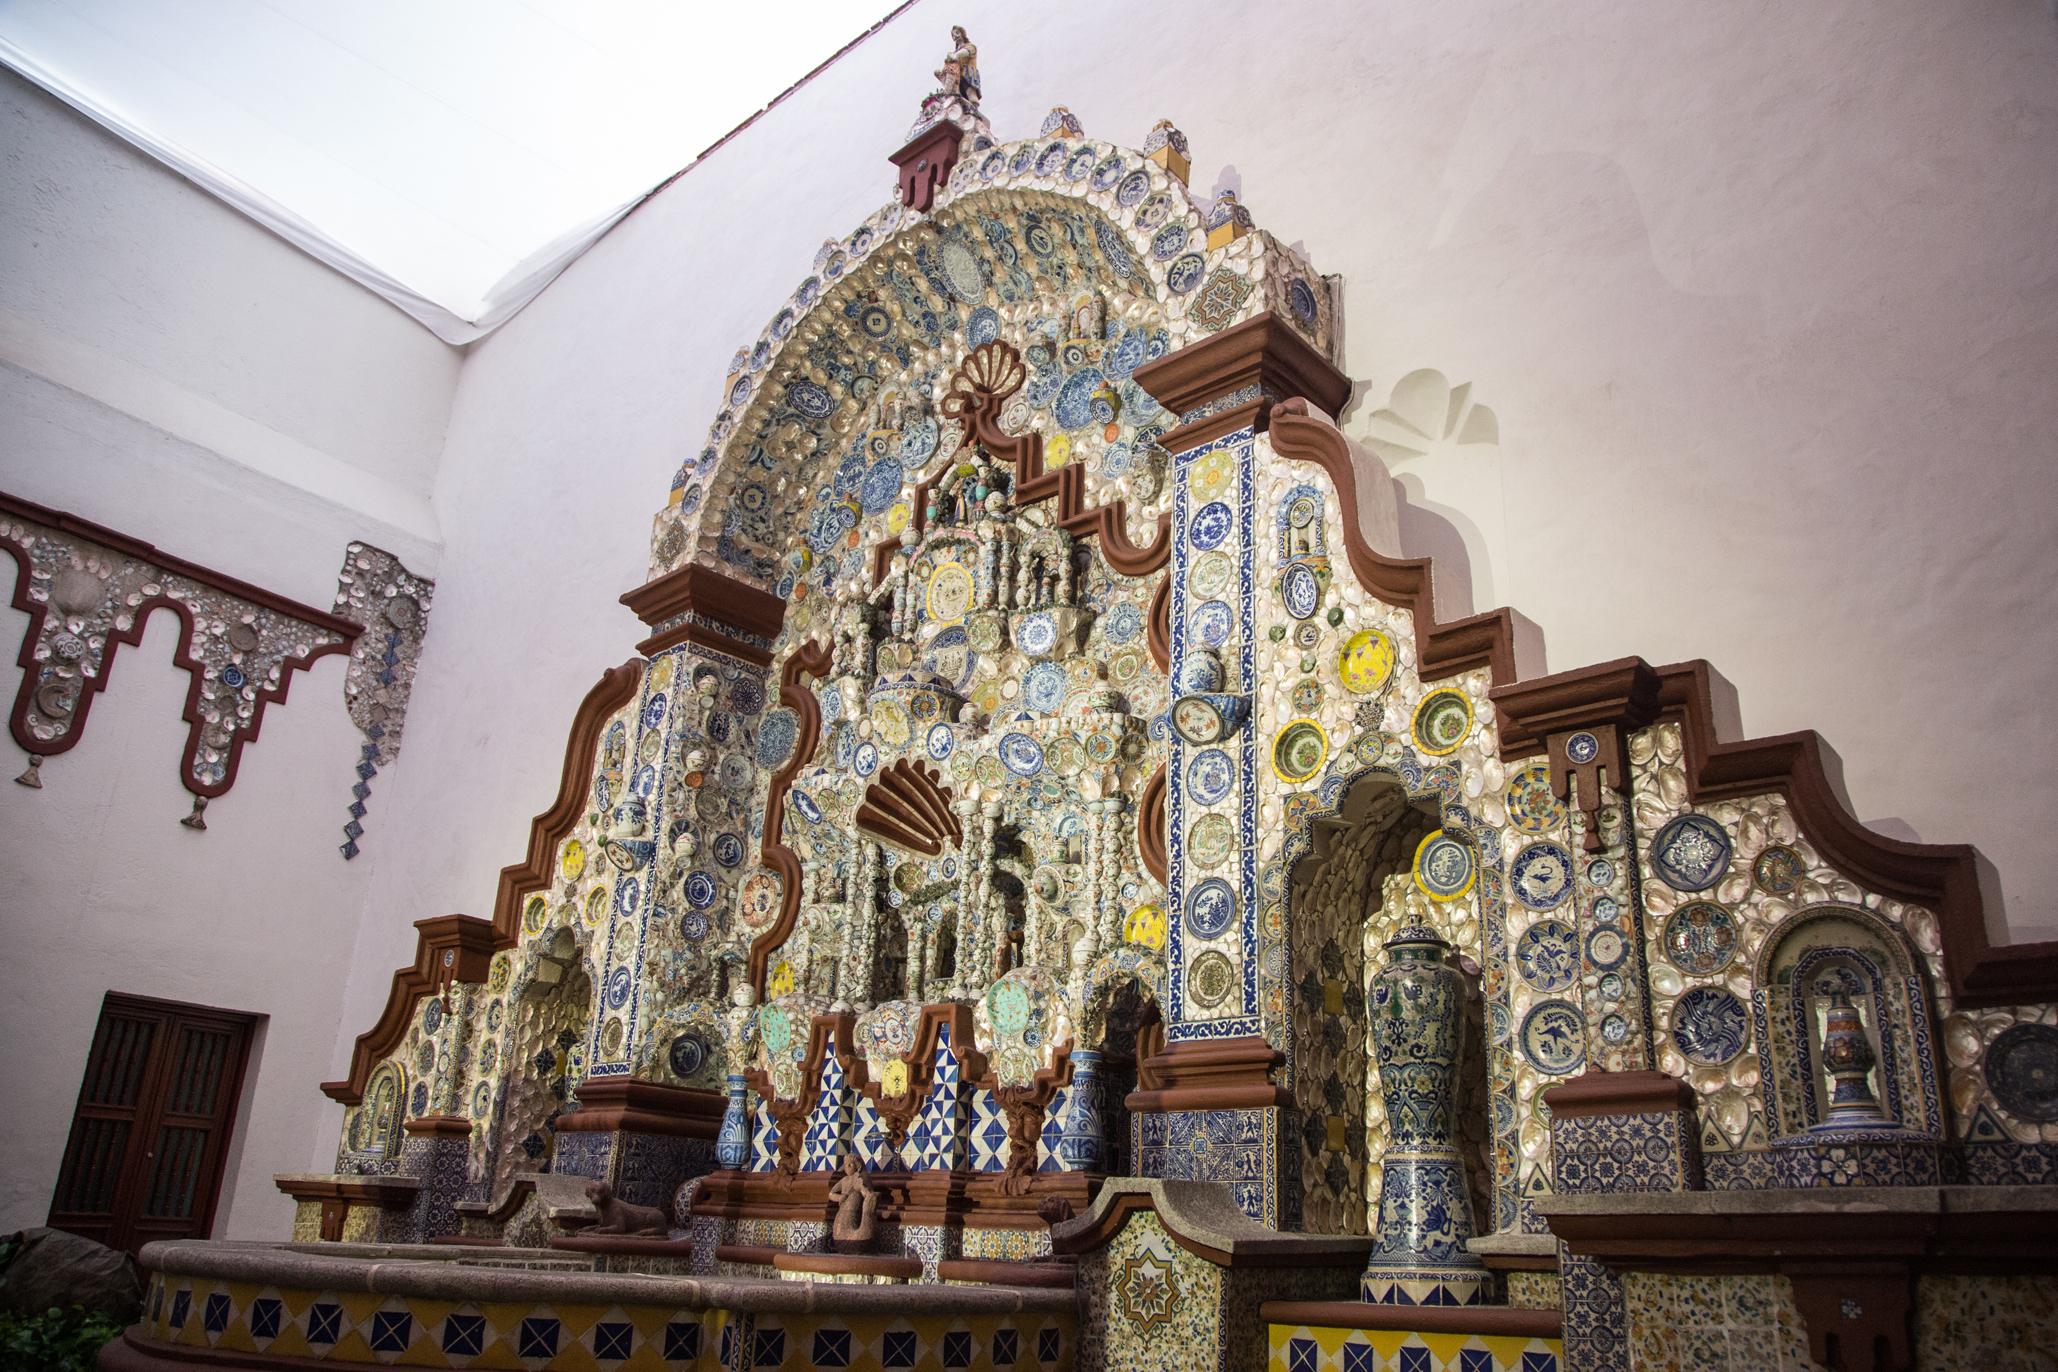 Museos en San Ángel